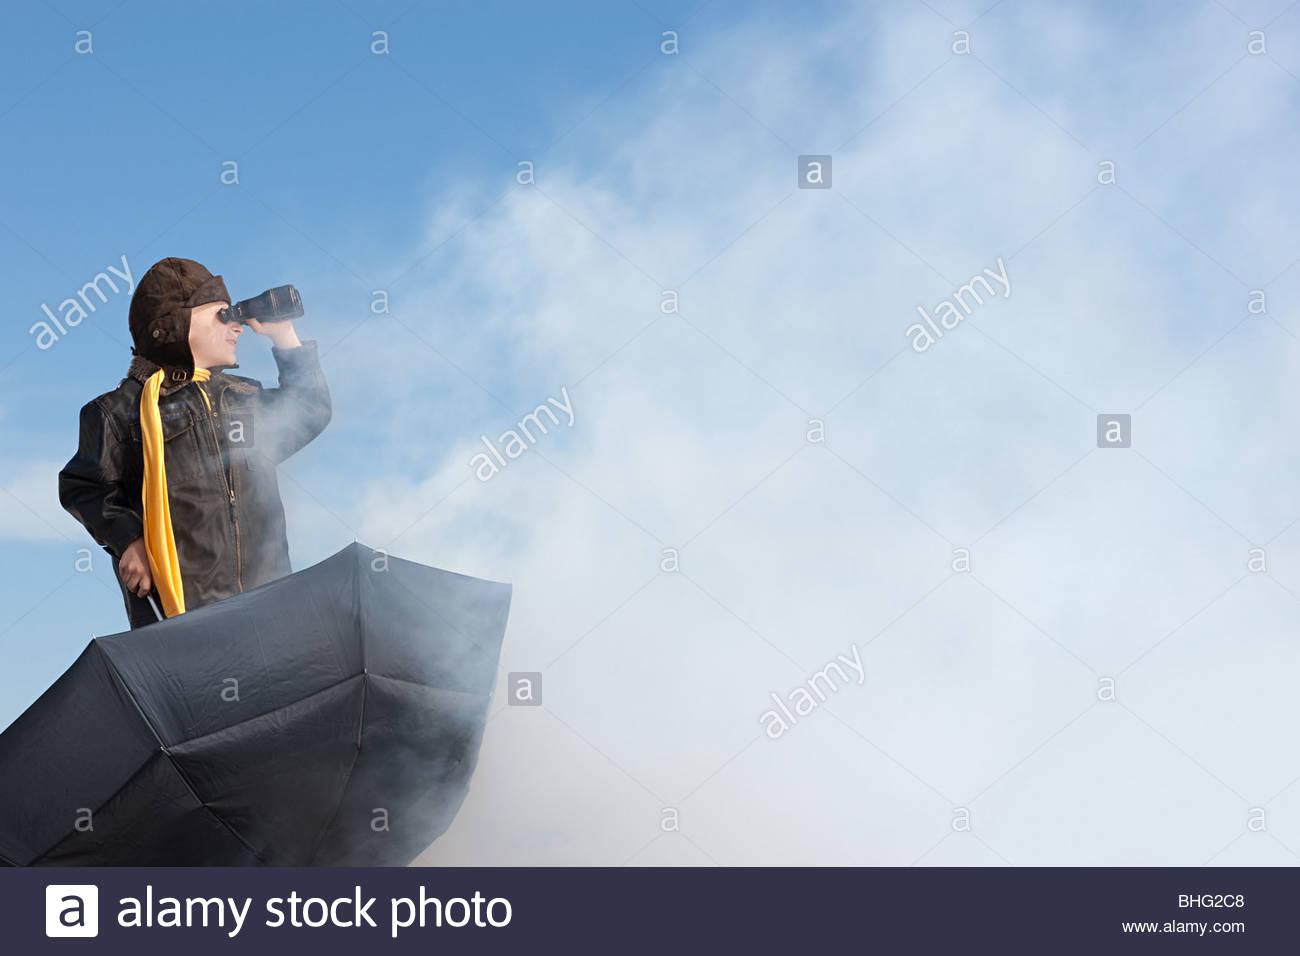 Boy with binoculars and umbrella - Stock Image